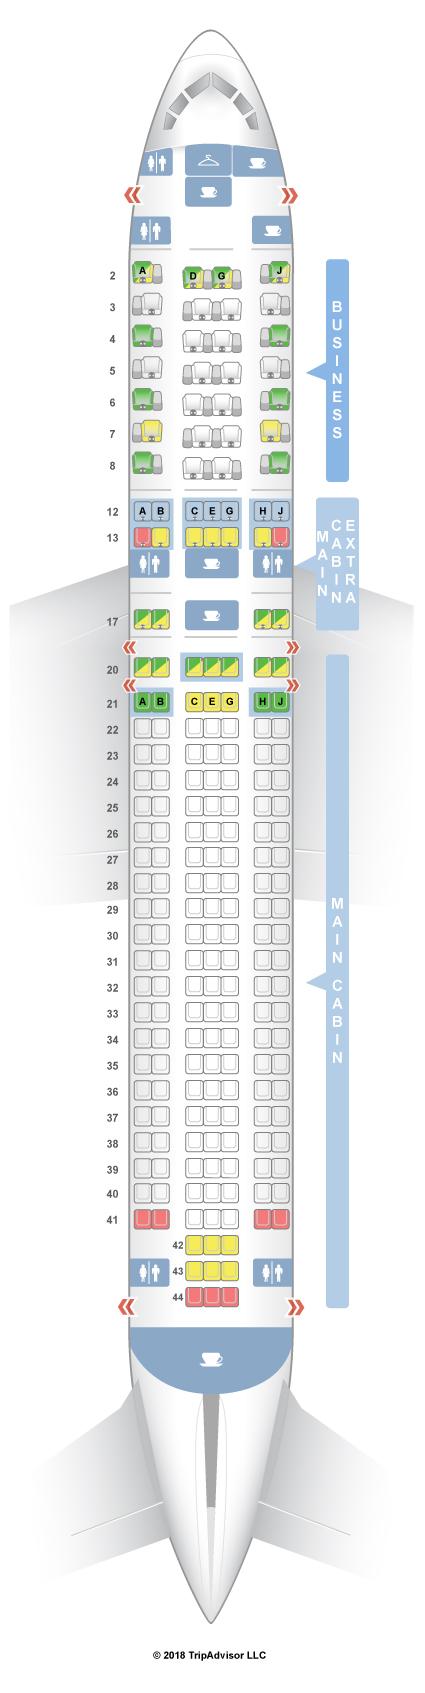 seatguru seat map american airlines boeing 767 300 763 v2